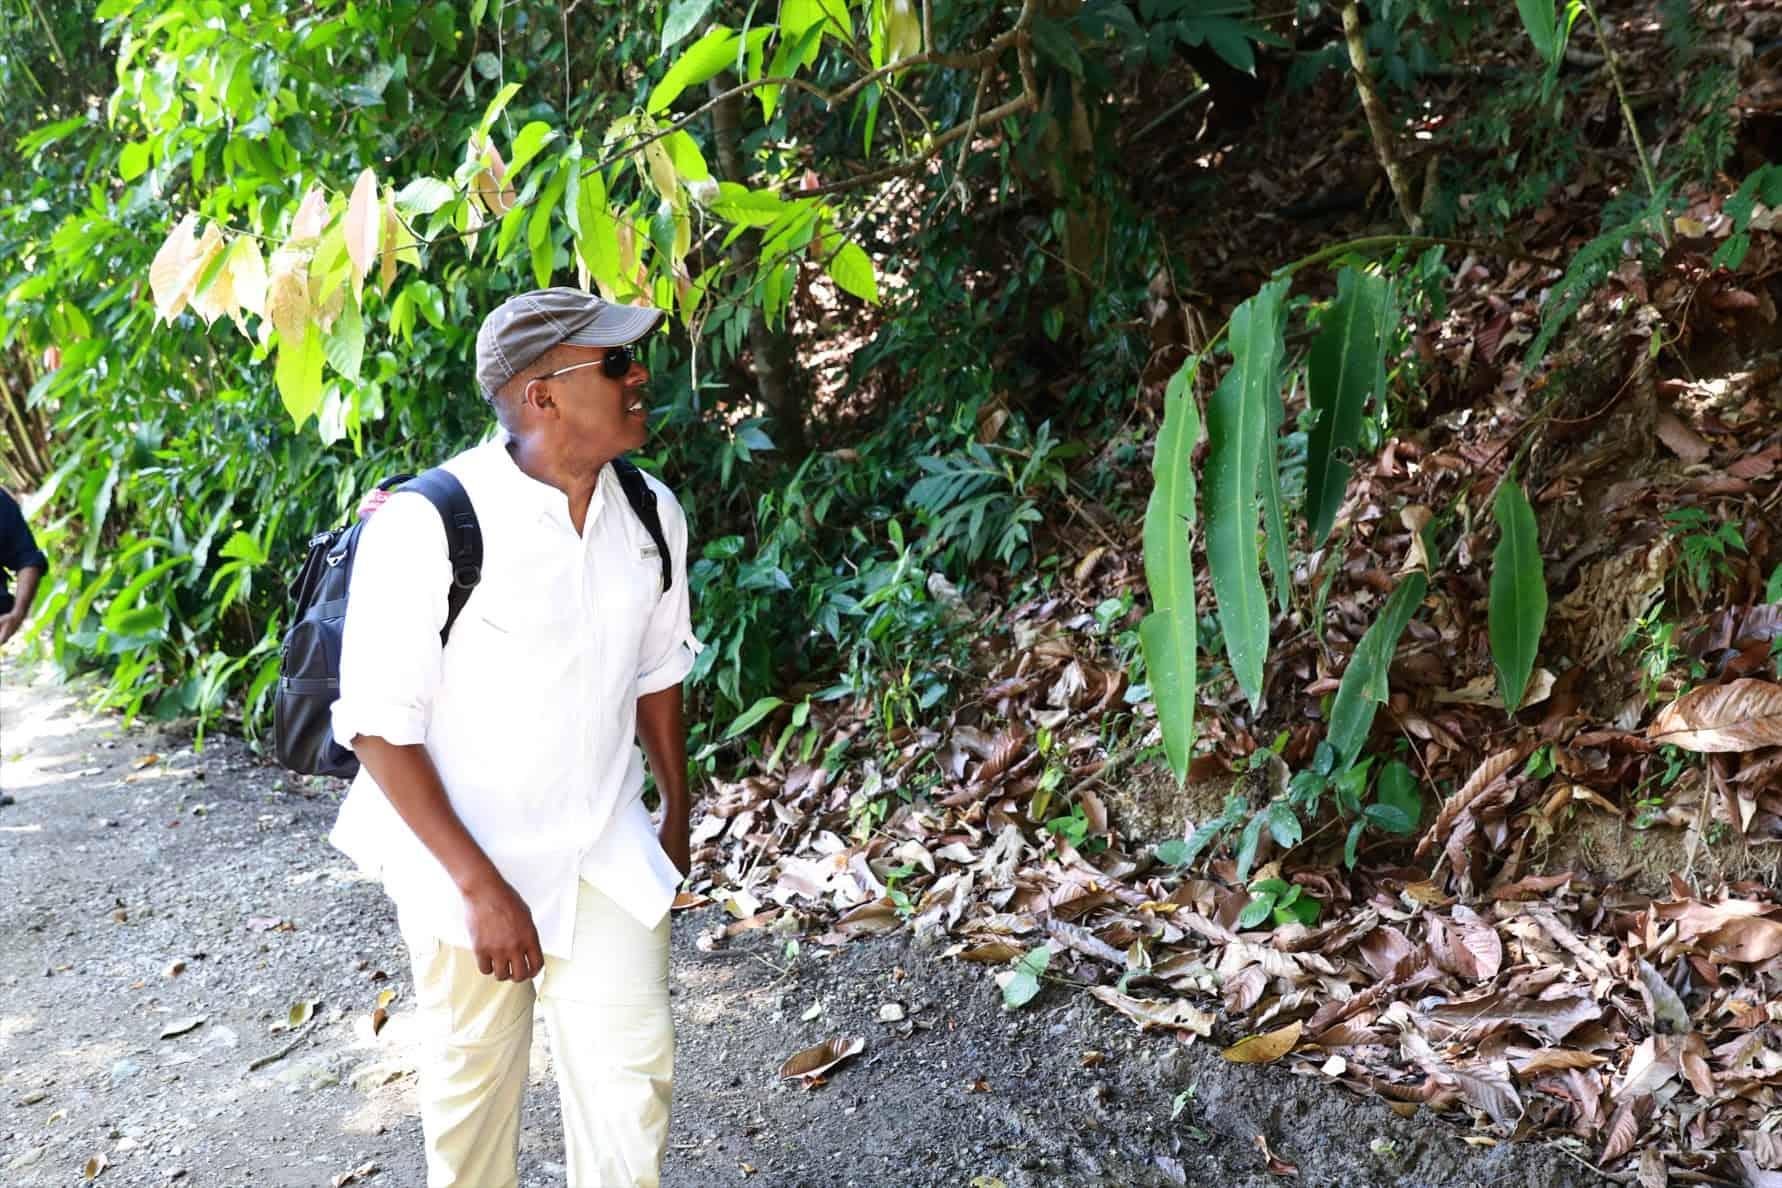 Ambassador Haney during his visit at the Corcovado park.